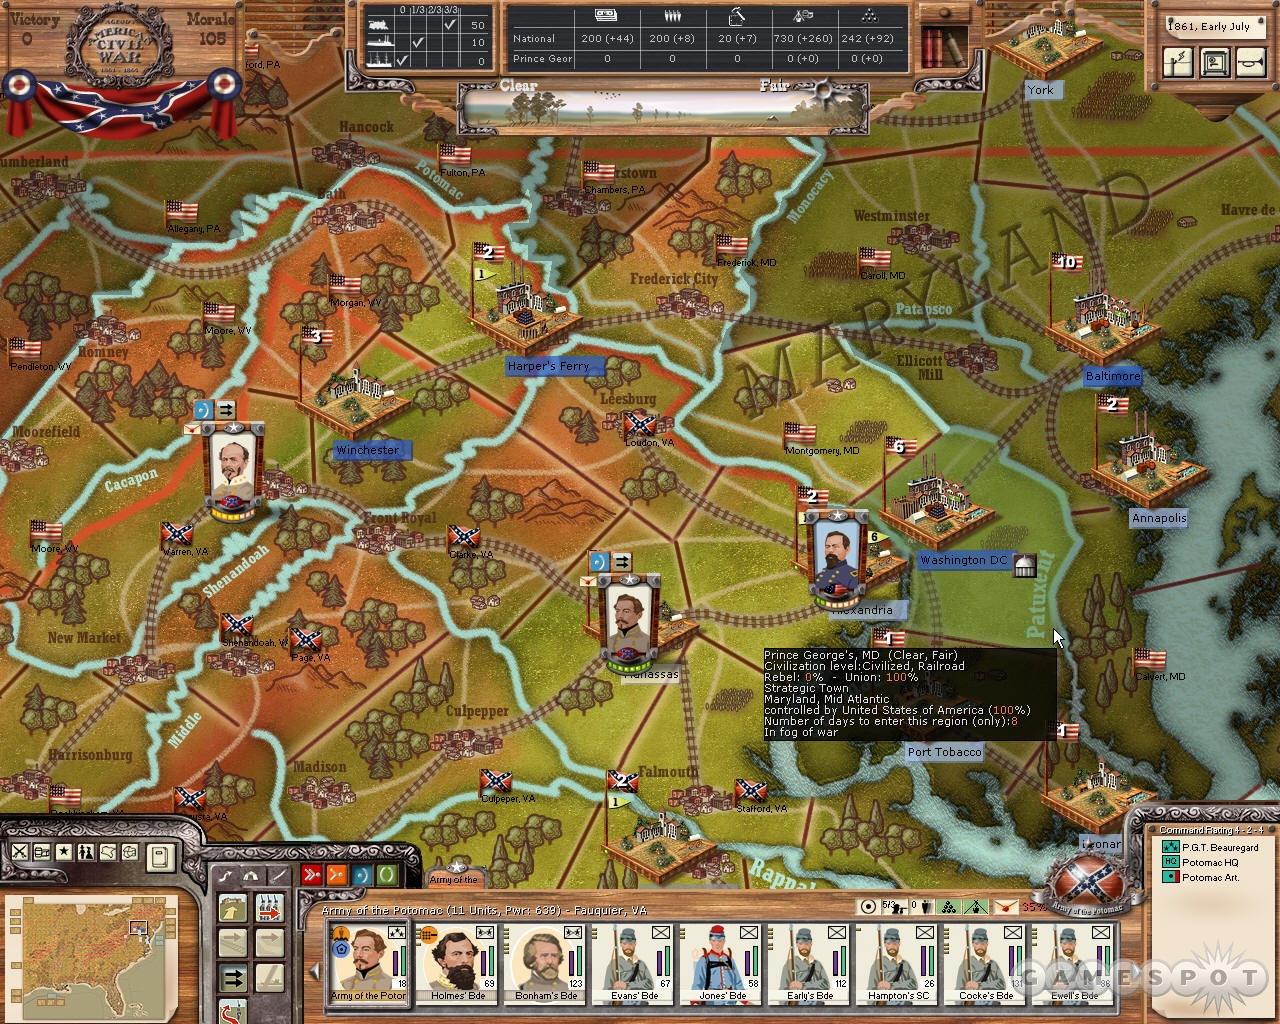 The First Battle of Bull Run, as seen through American Civil War.